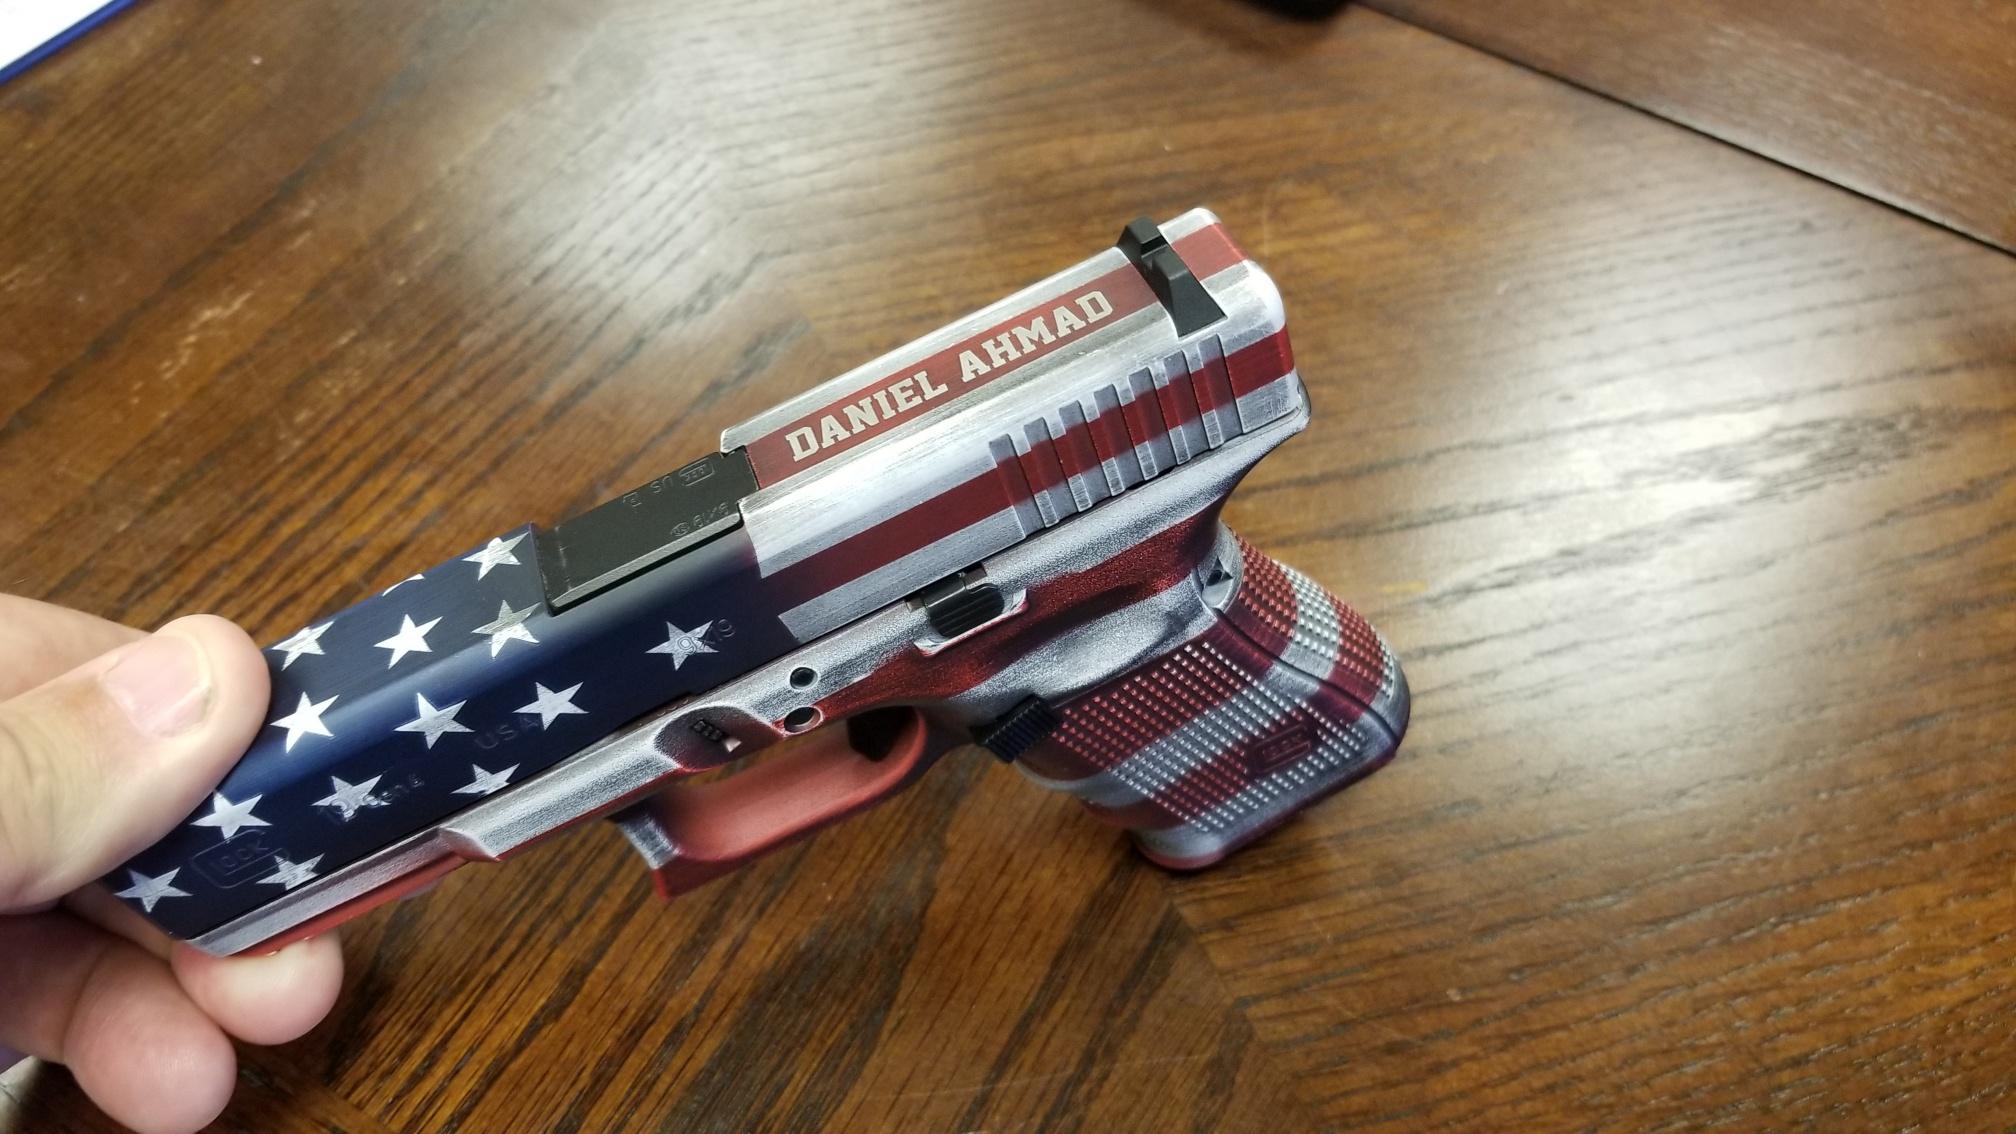 Pistol Engraving - Pistol Customization - Pistol Personalization - Engraved Pistol - Engraved handgun - Firearm Engraving Projects - Engrave It houston